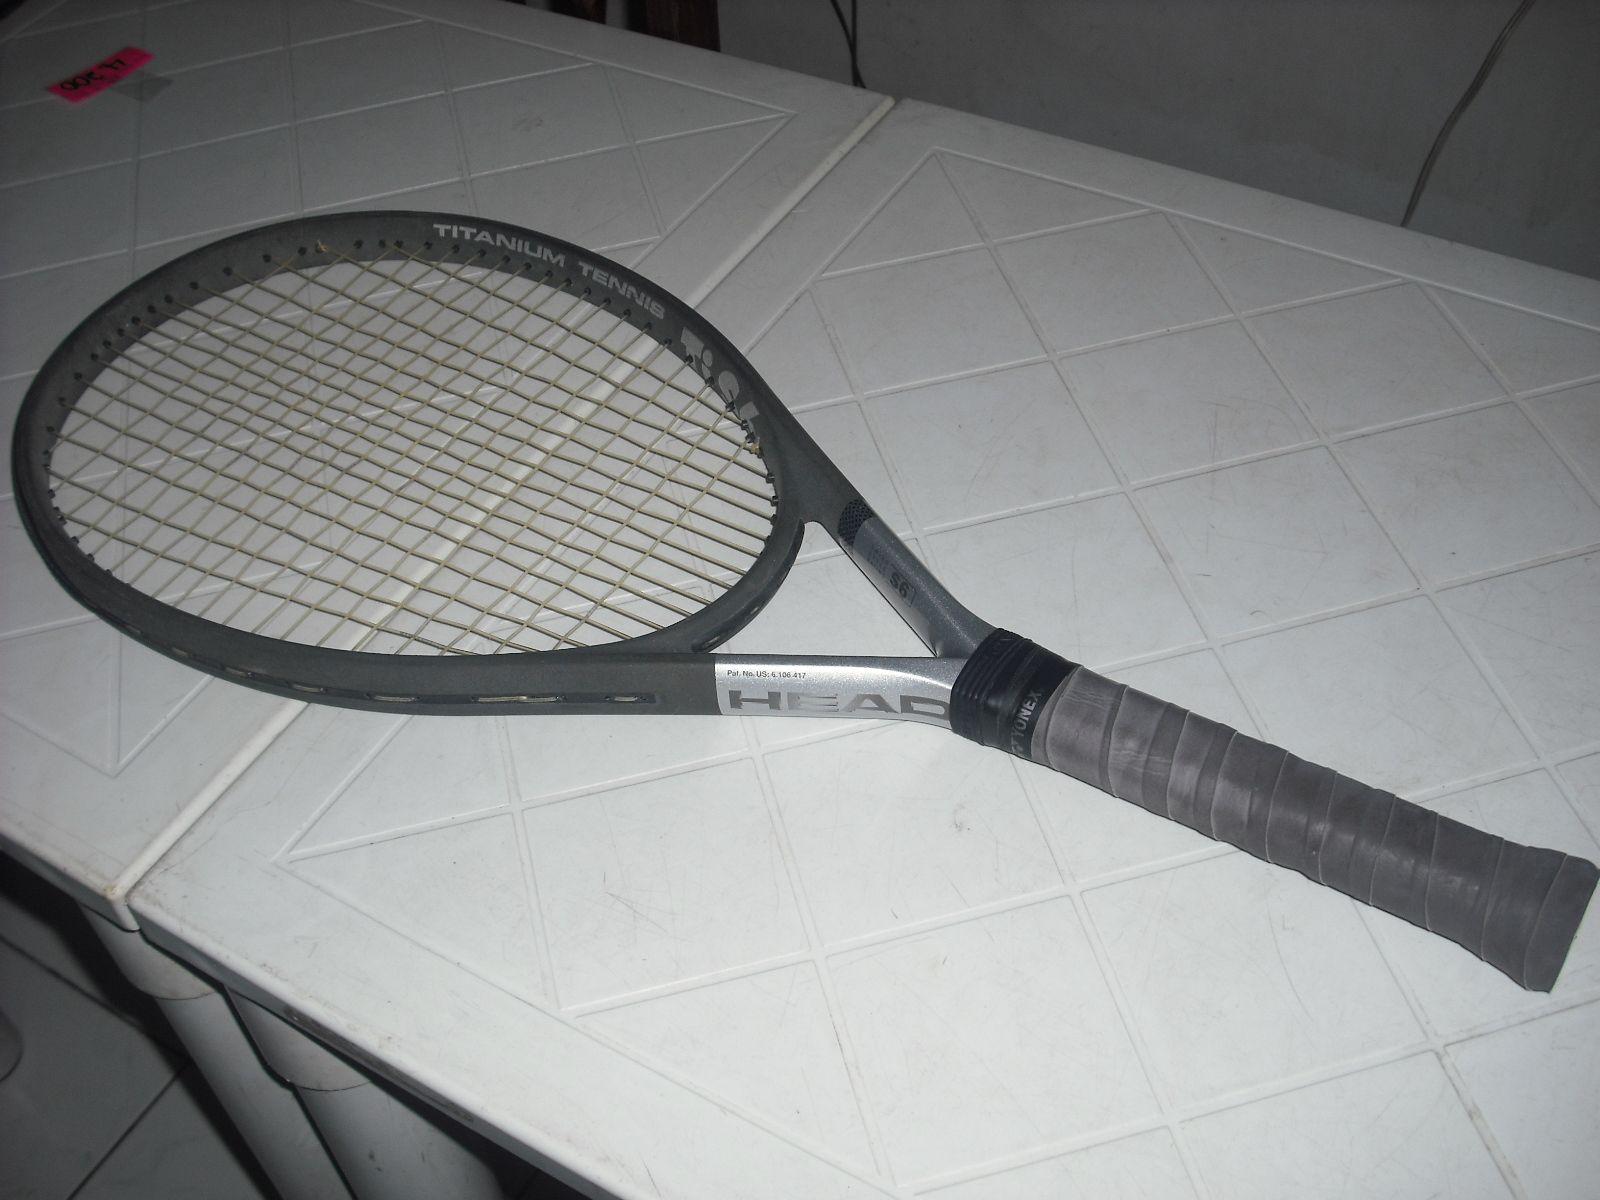 Head tennis racket   Head tennis, Tennis racket, Head